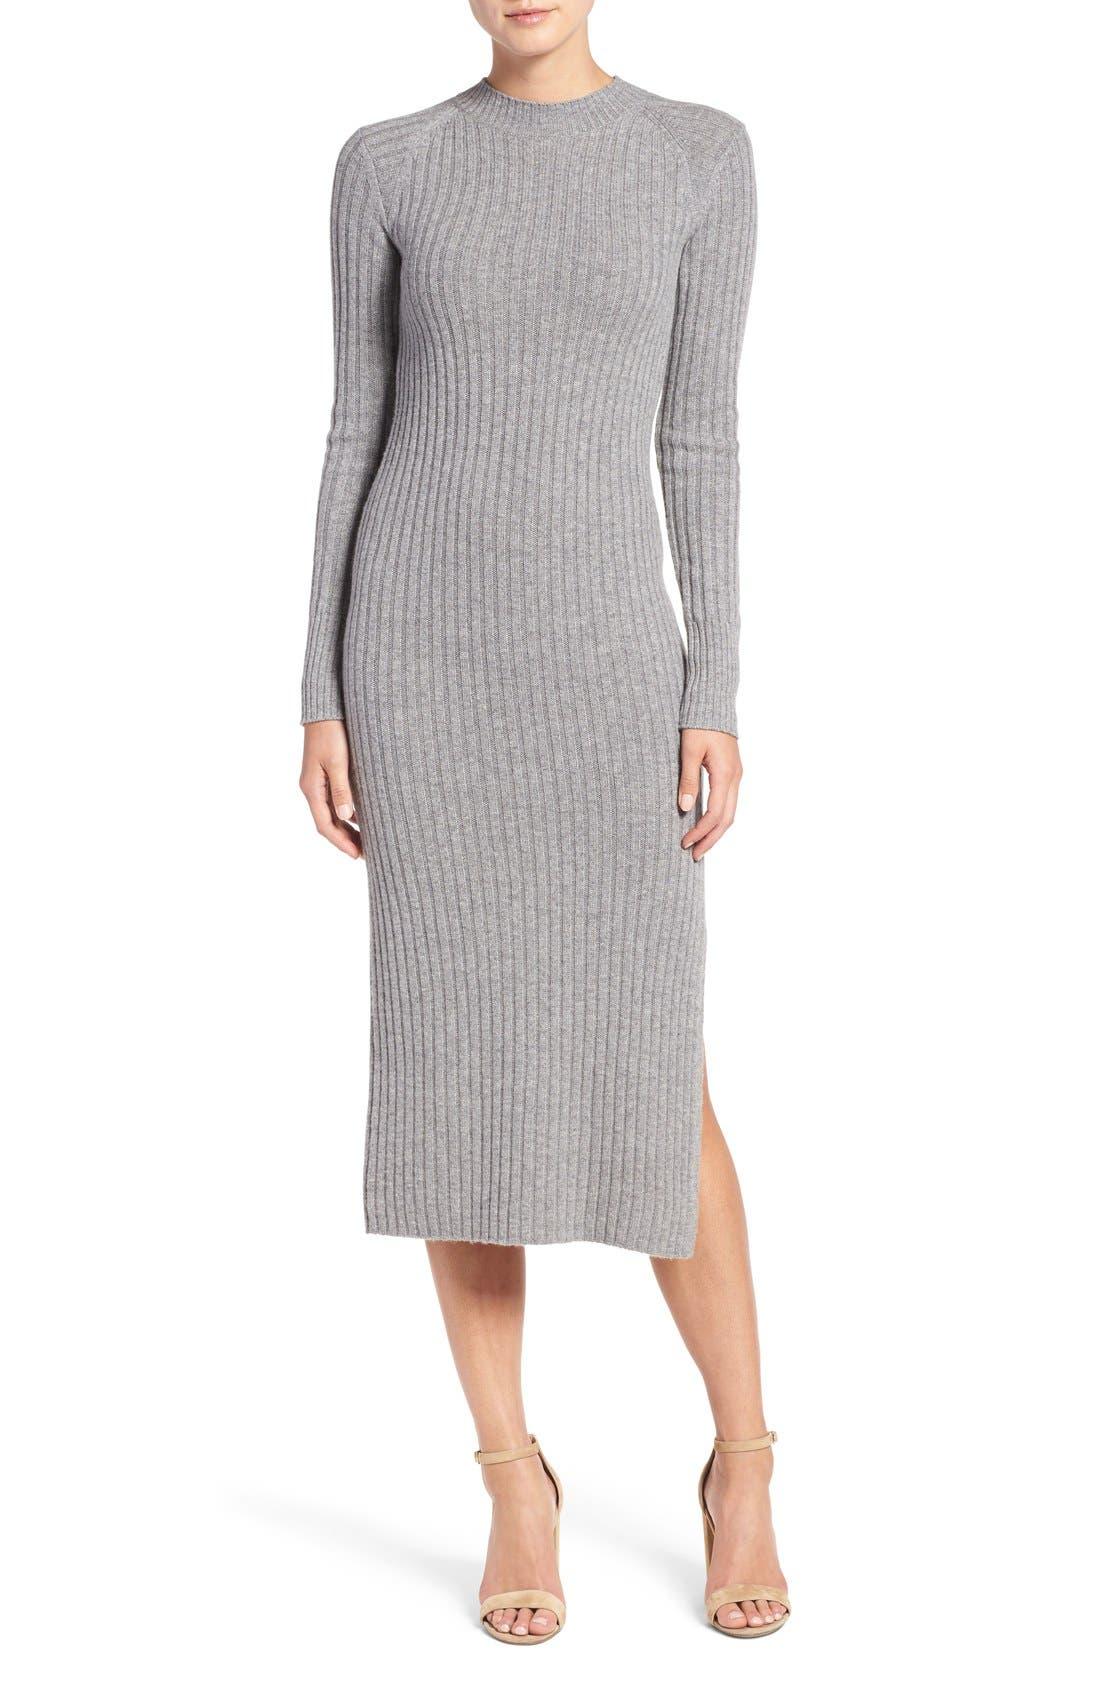 AG Reign Merino Wool & Cashmere Sweater Midi Dress | Nordstrom